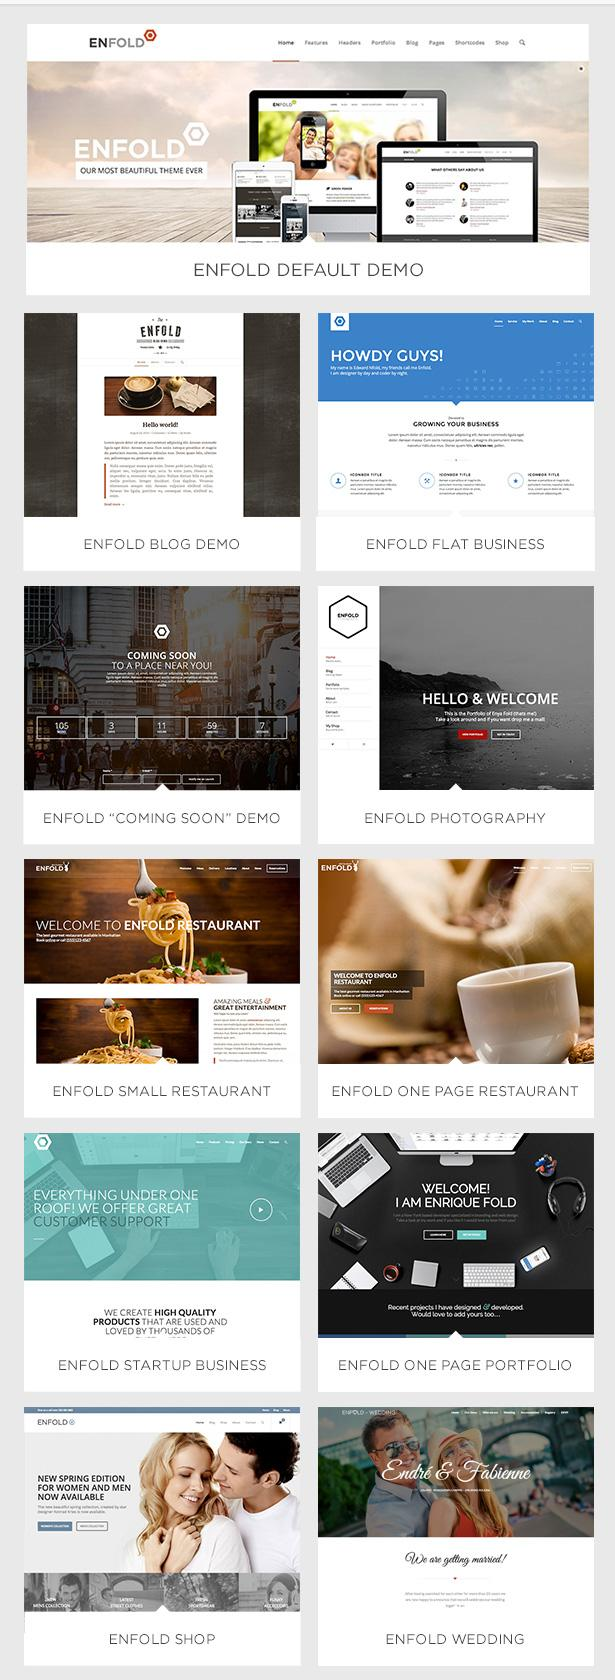 Enfold WordPress Theme Demos